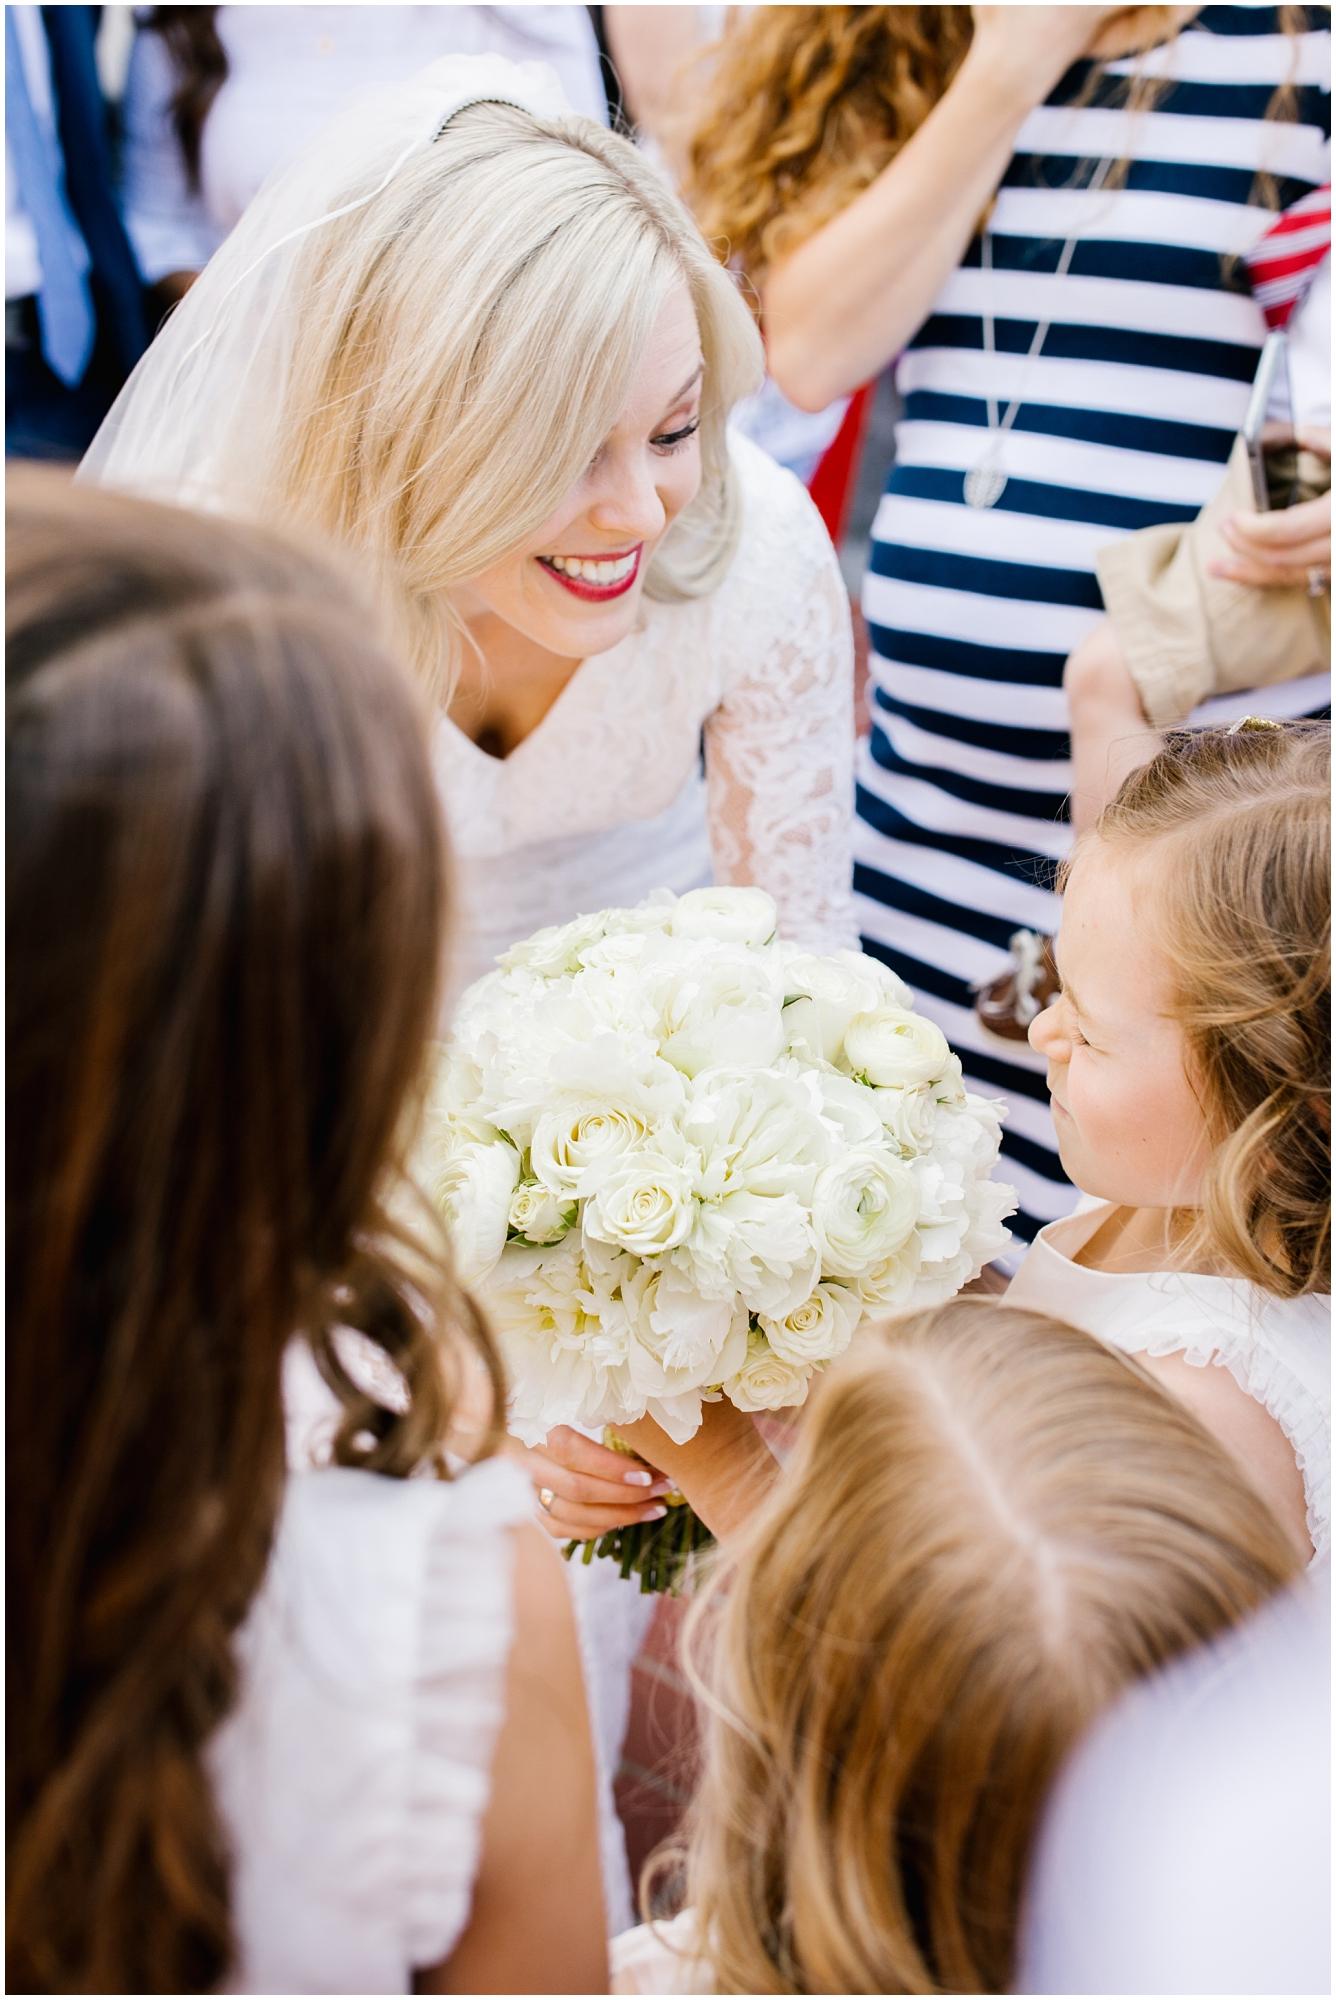 CherylandTyler-21_Lizzie-B-Imagery-Utah-Wedding-Photographer-Park-City-Salt-Lake-City-Temple-Wells-Fargo-Building.jpg